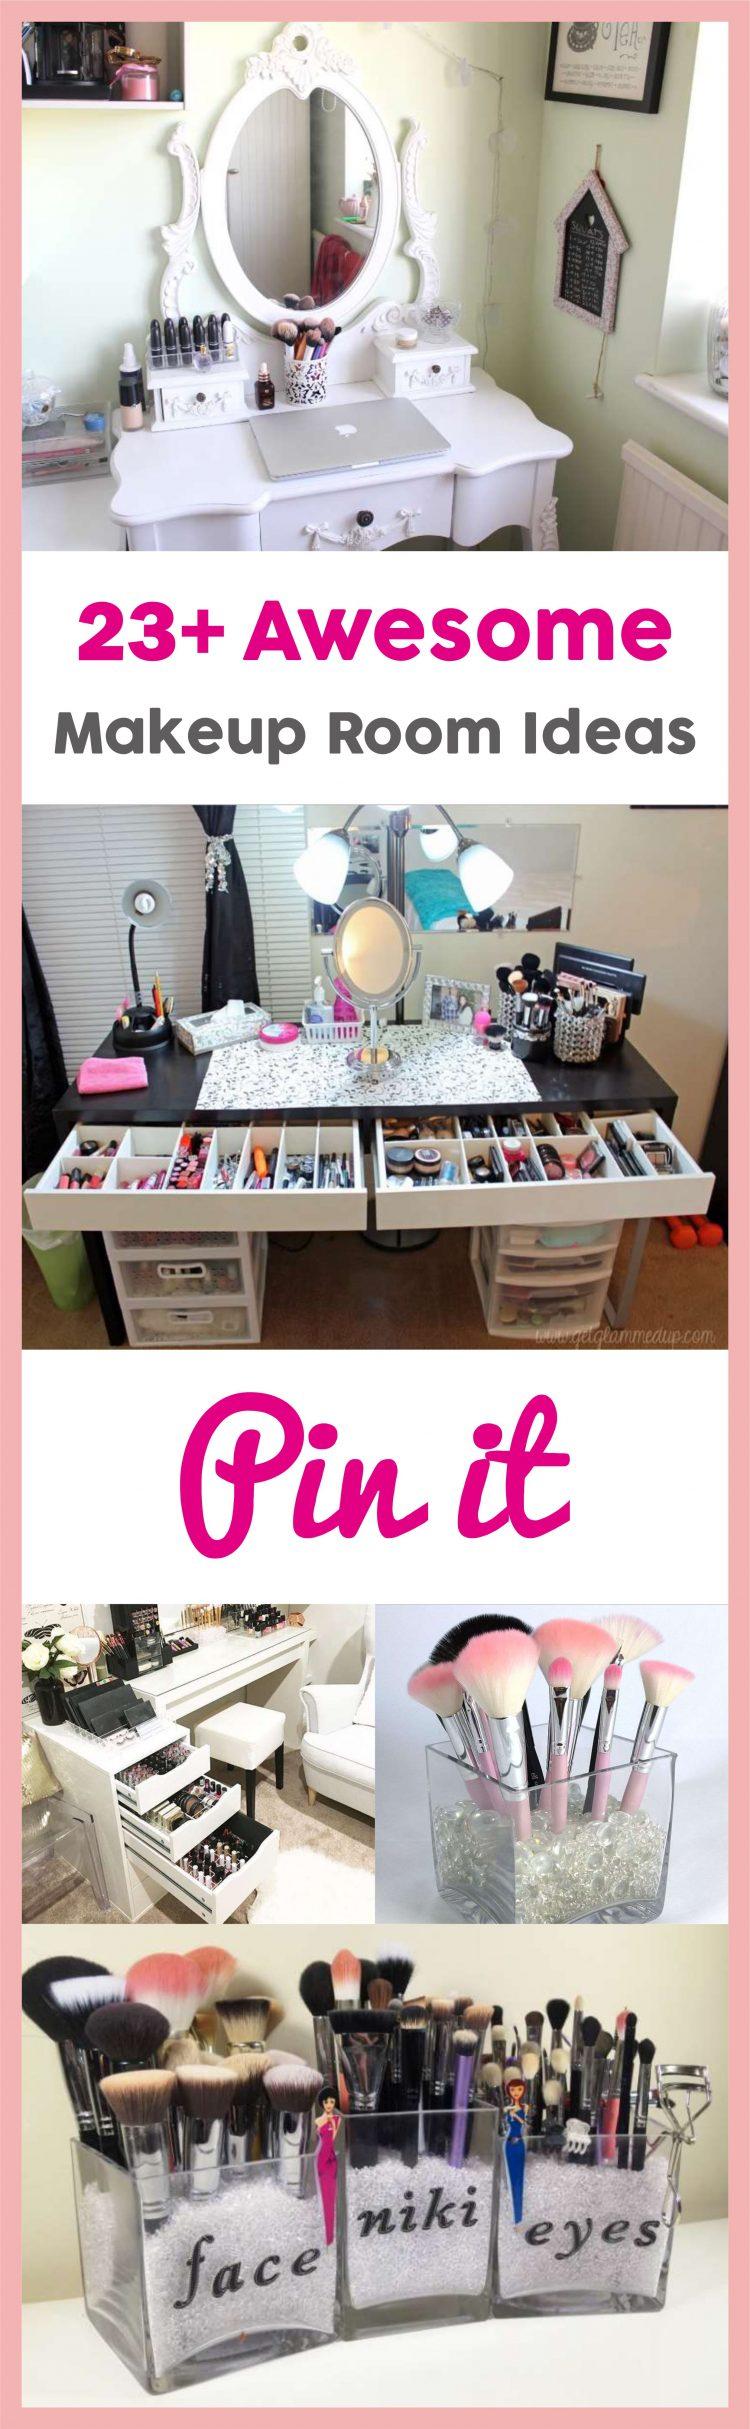 23+ DIY Makeup Room Ideas, Organizer, Storage and Decorating on Makeup Room Ideas  id=95037